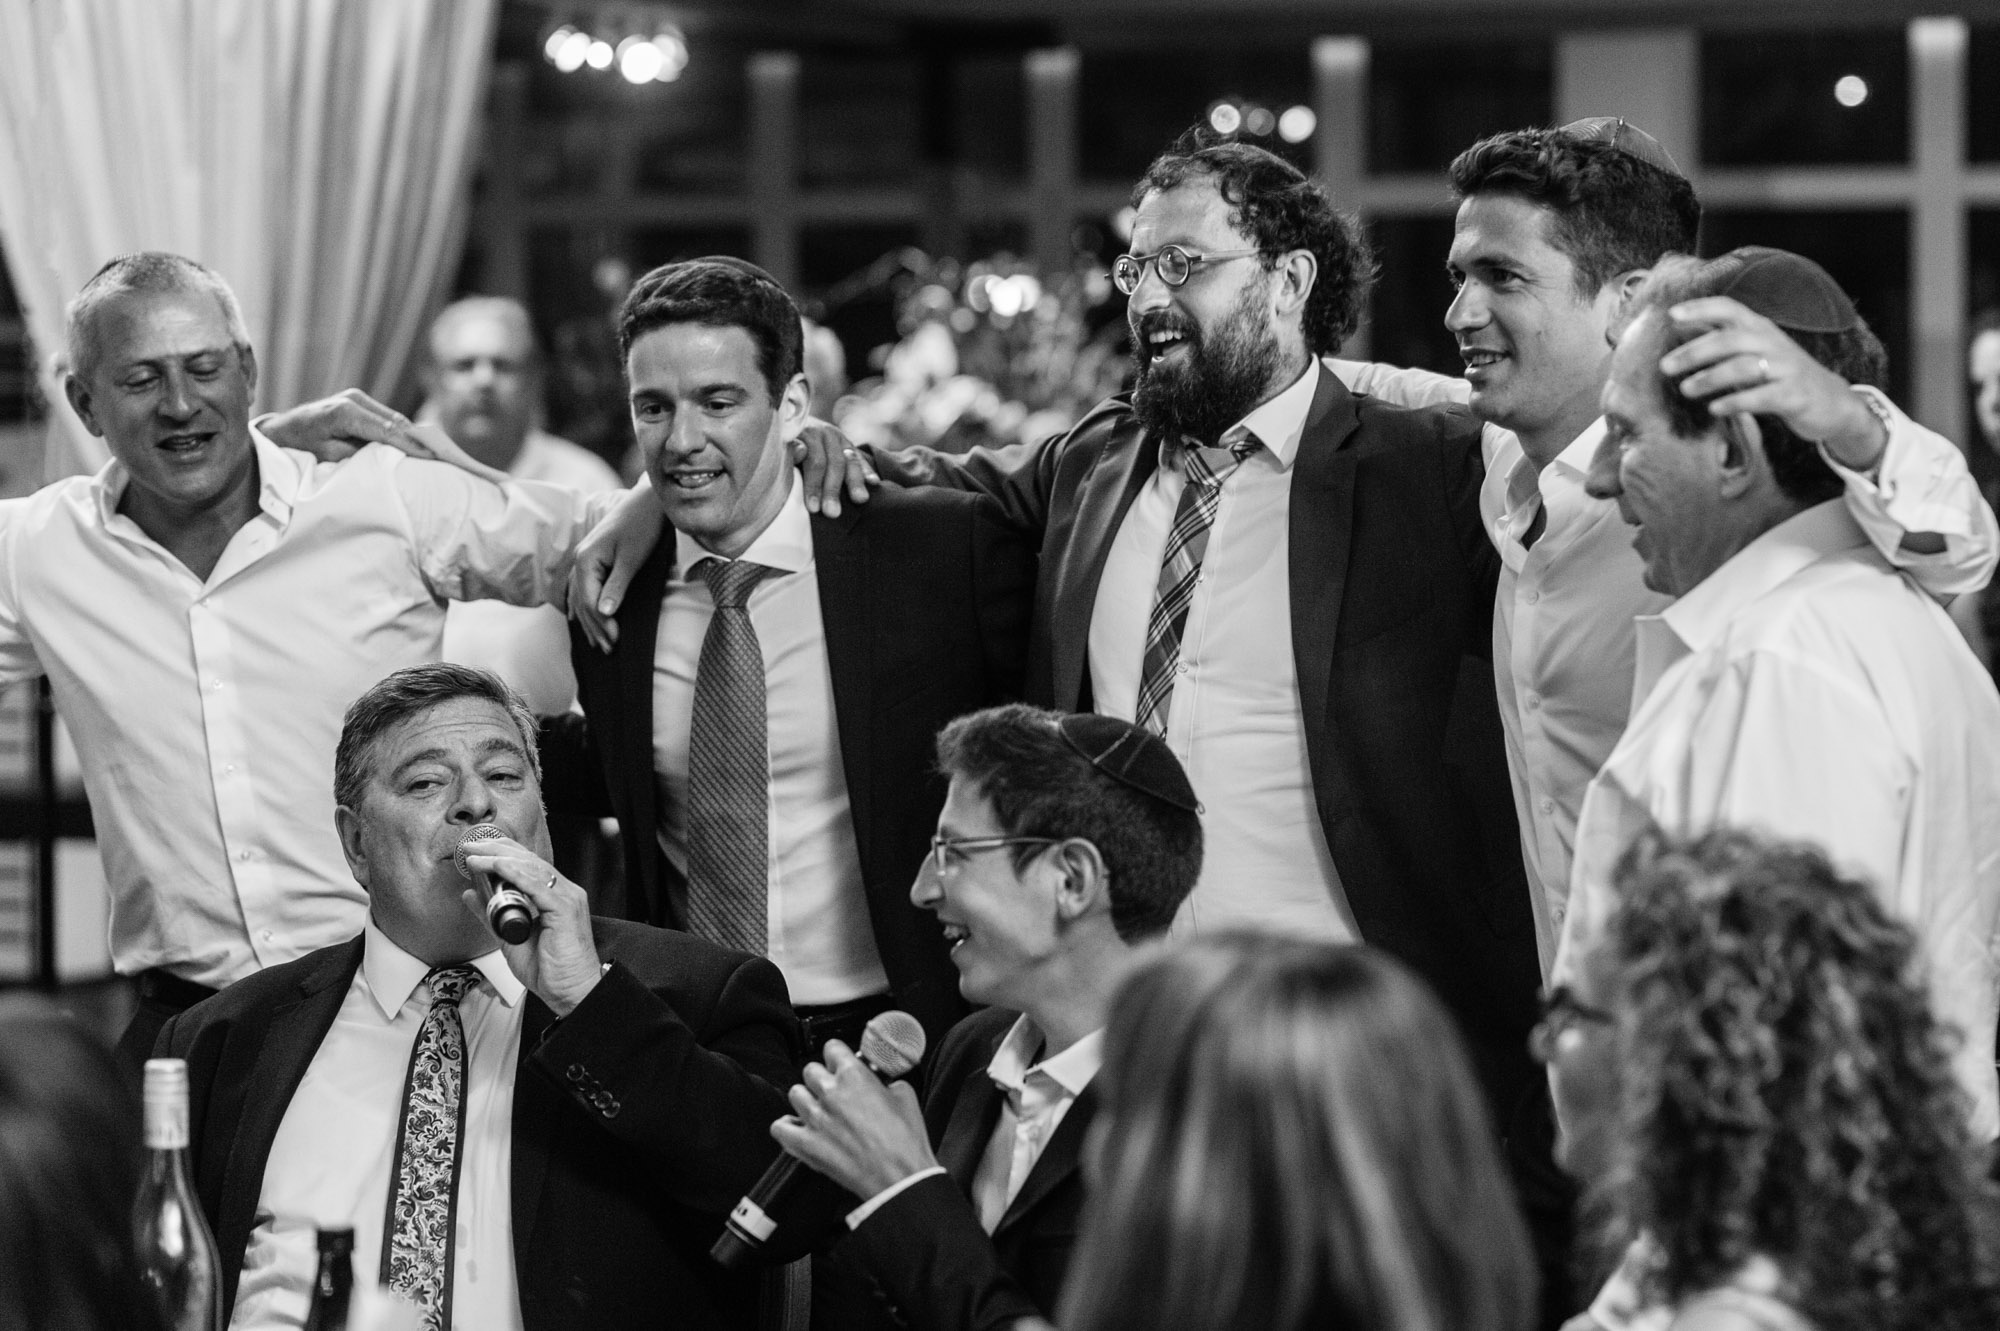 John-henry-wedding-photo-formalities-001-12.JPG